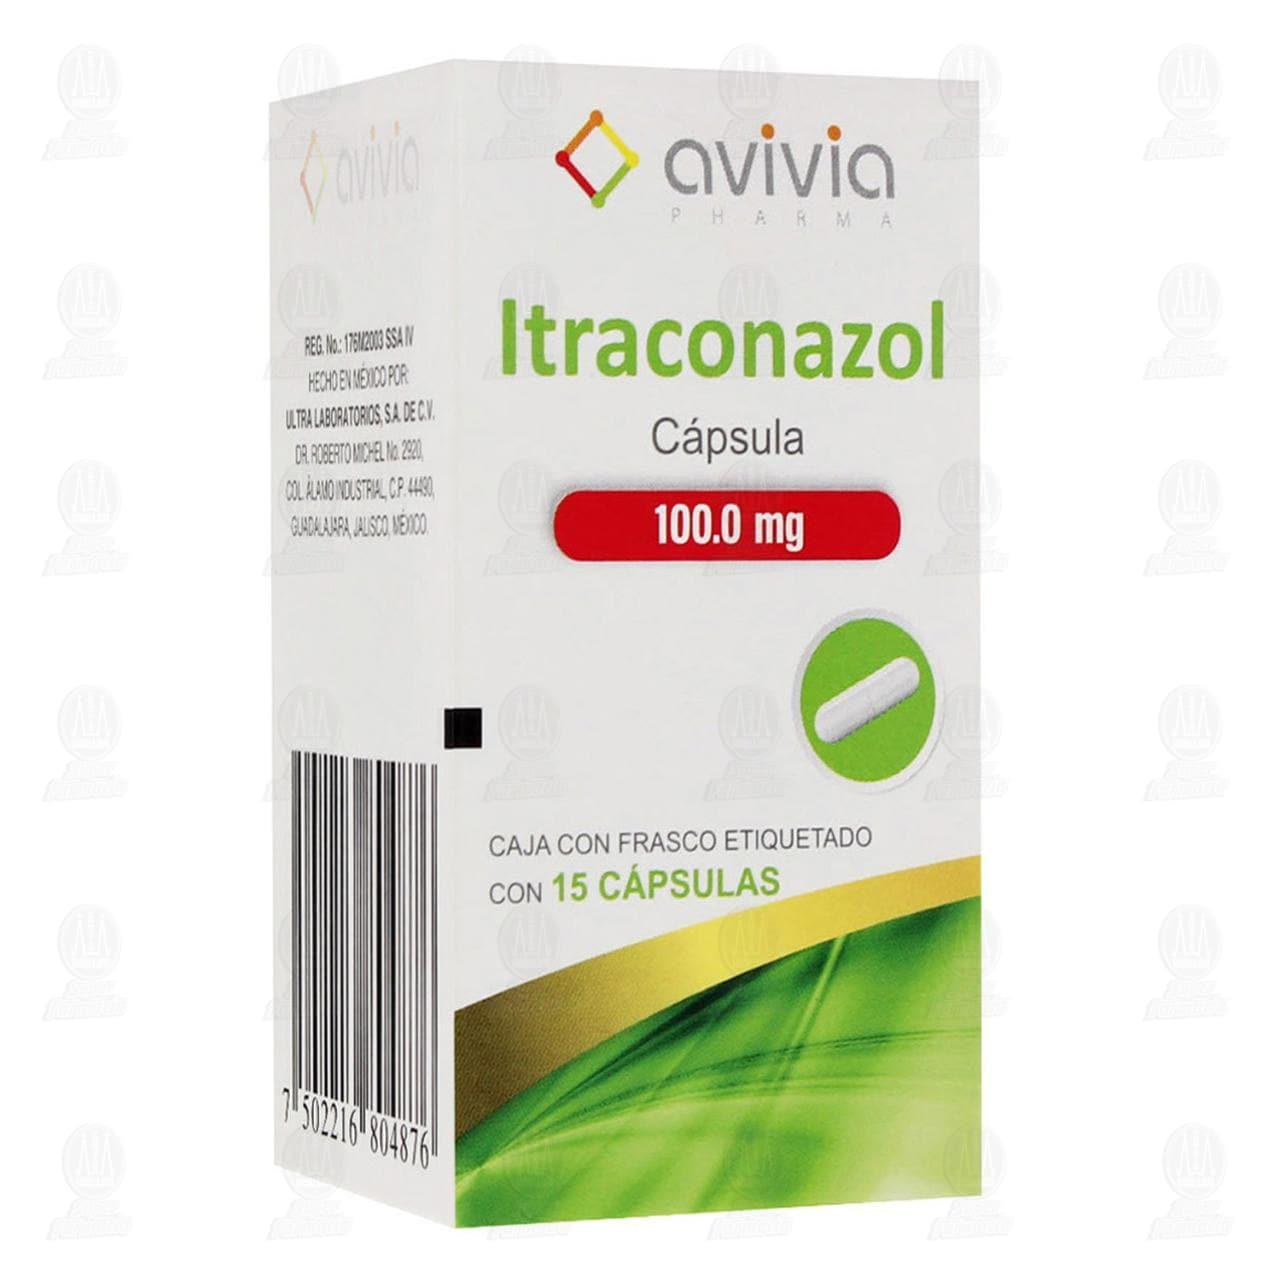 Comprar Itraconazol 100mg 15 Cápsulas Avivia Pharma en Farmacias Guadalajara